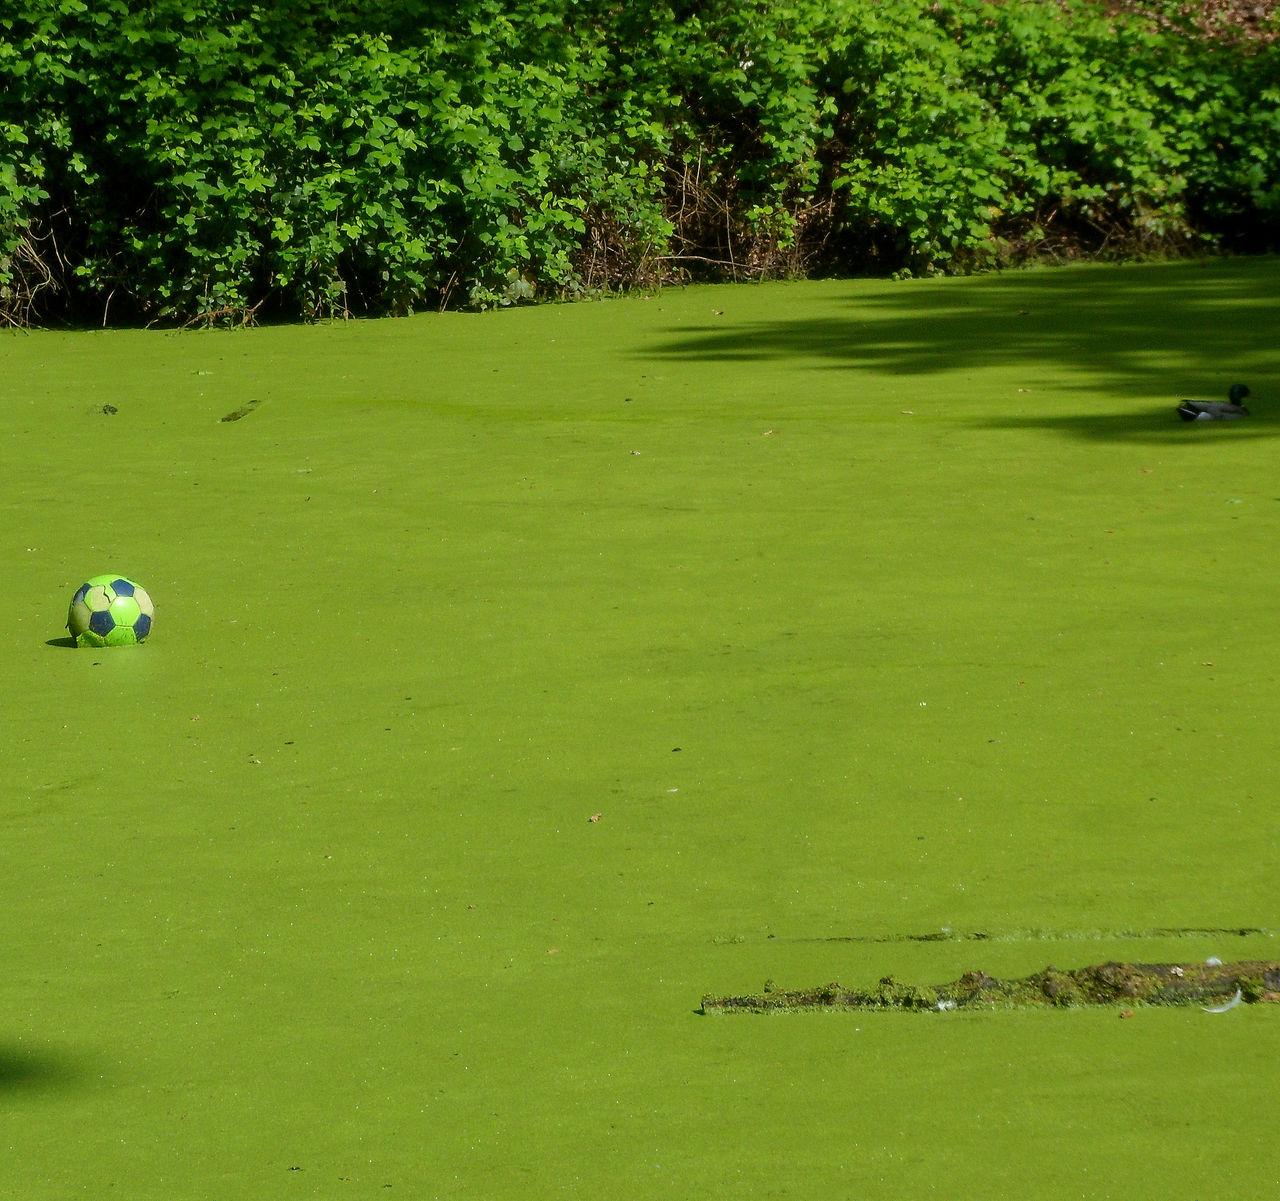 "yves molac entre le ballon et le canard le croco ""semblant"" hésite!!!!"